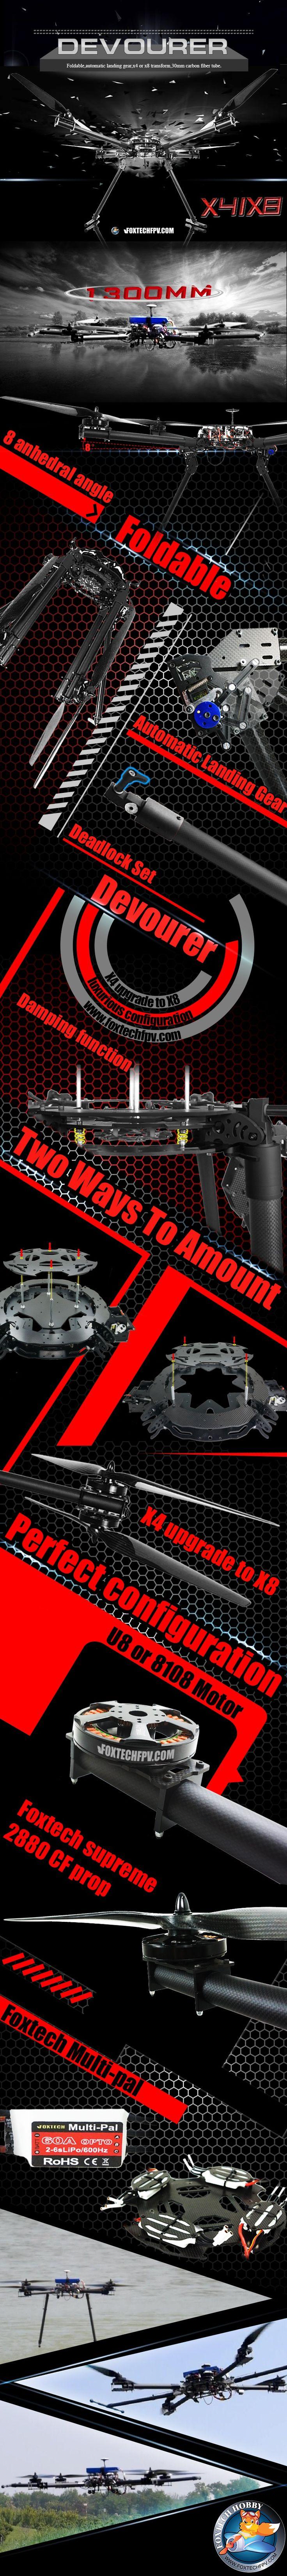 Foxtech Hobby:DJI multicopter multirotor TMOTOR T-Motor NAZA FPV handheld gimb...